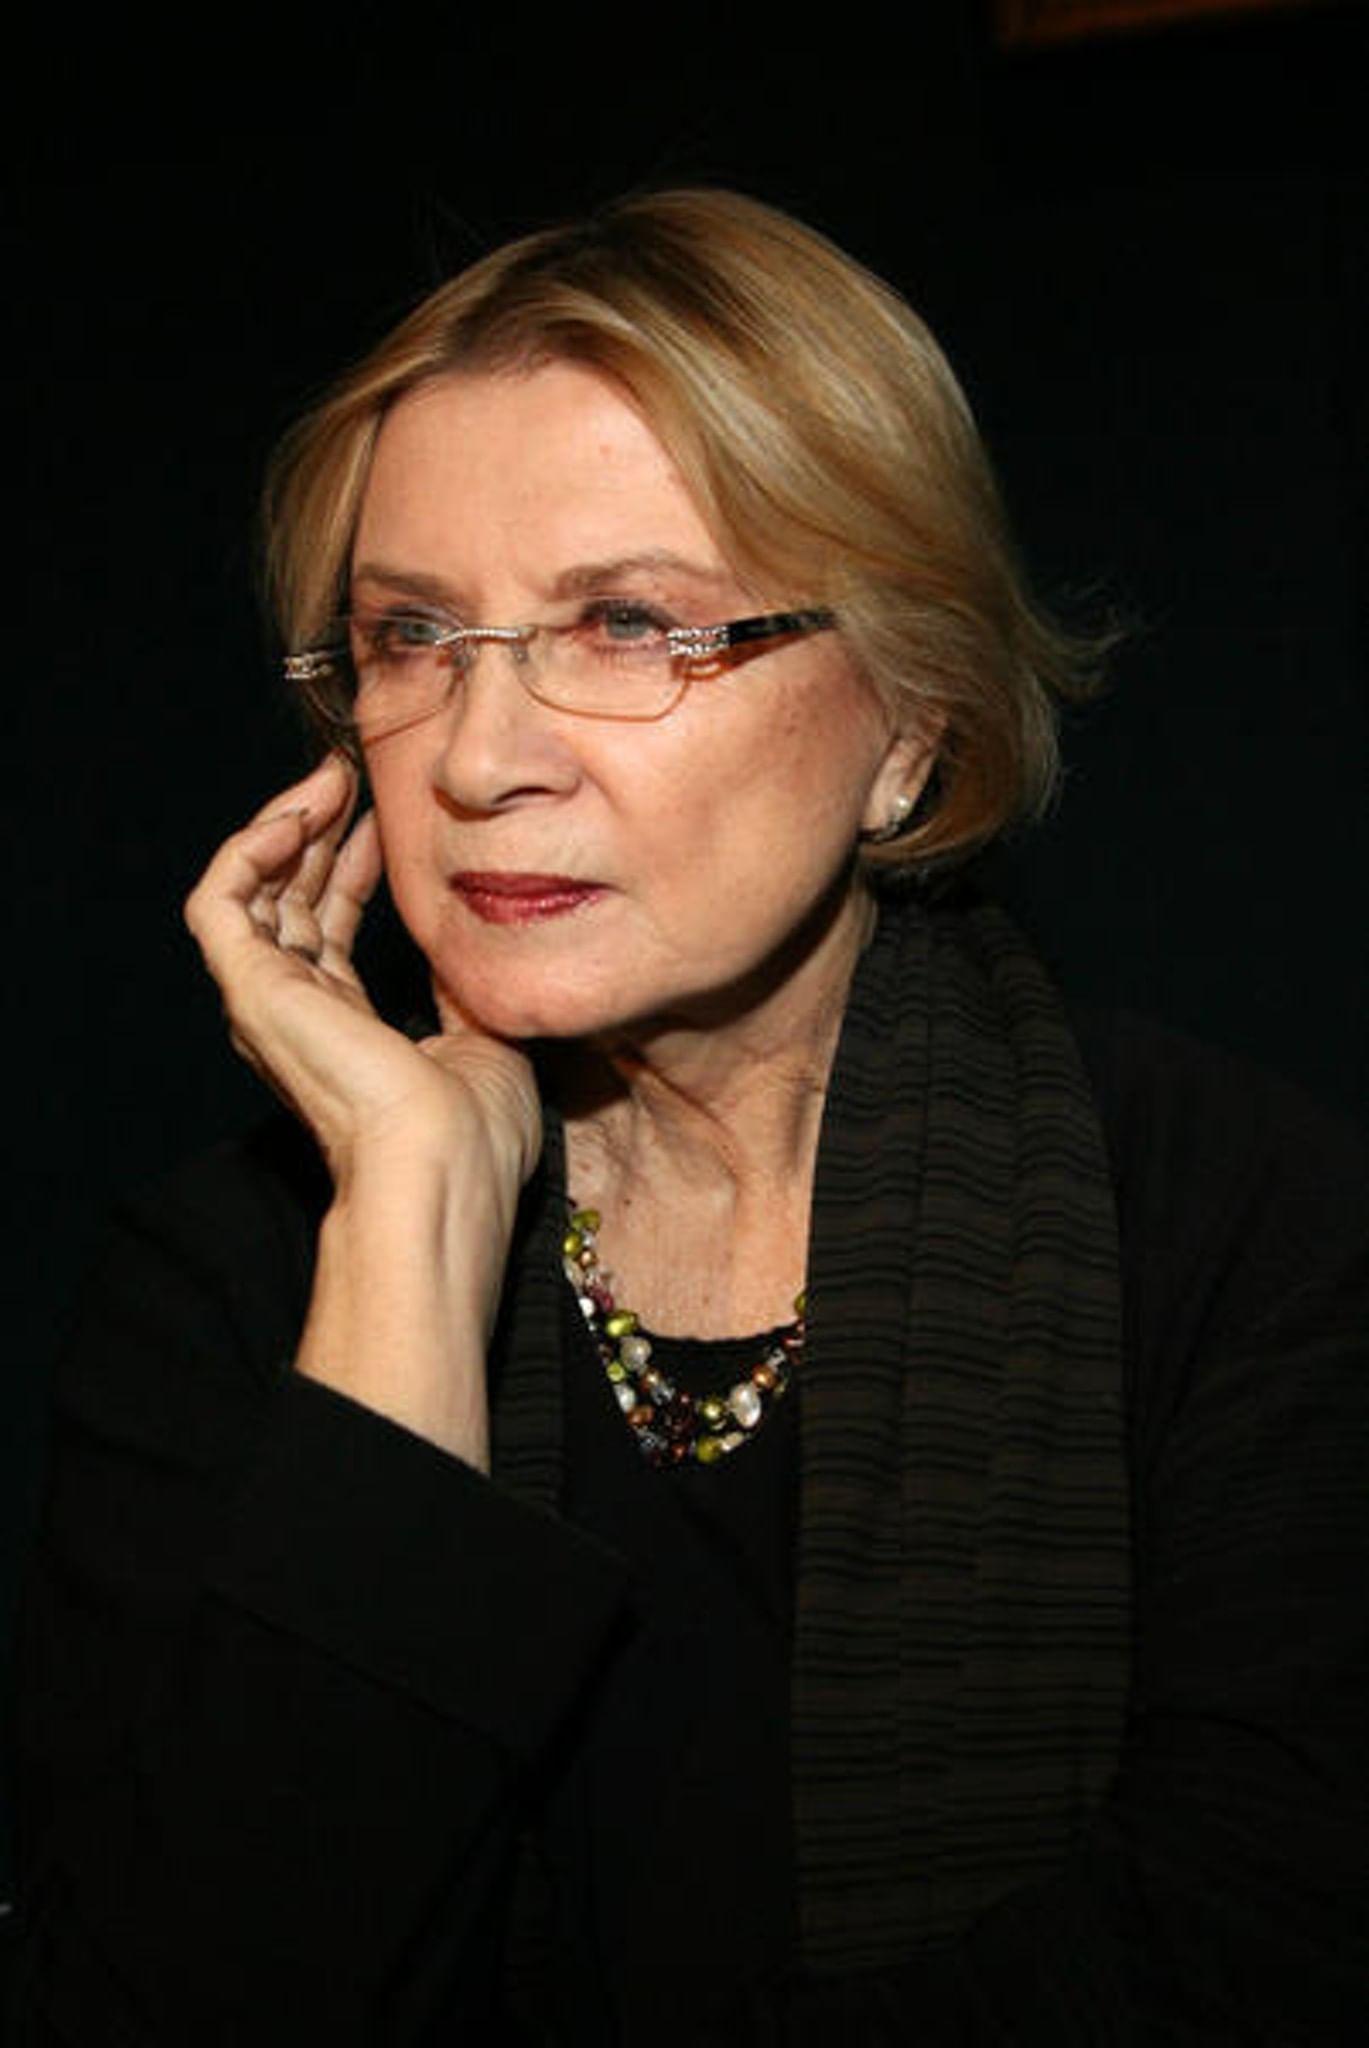 Алла Демидова (актриса) биография, фото, личная жизнь, новости 2018 изоражения